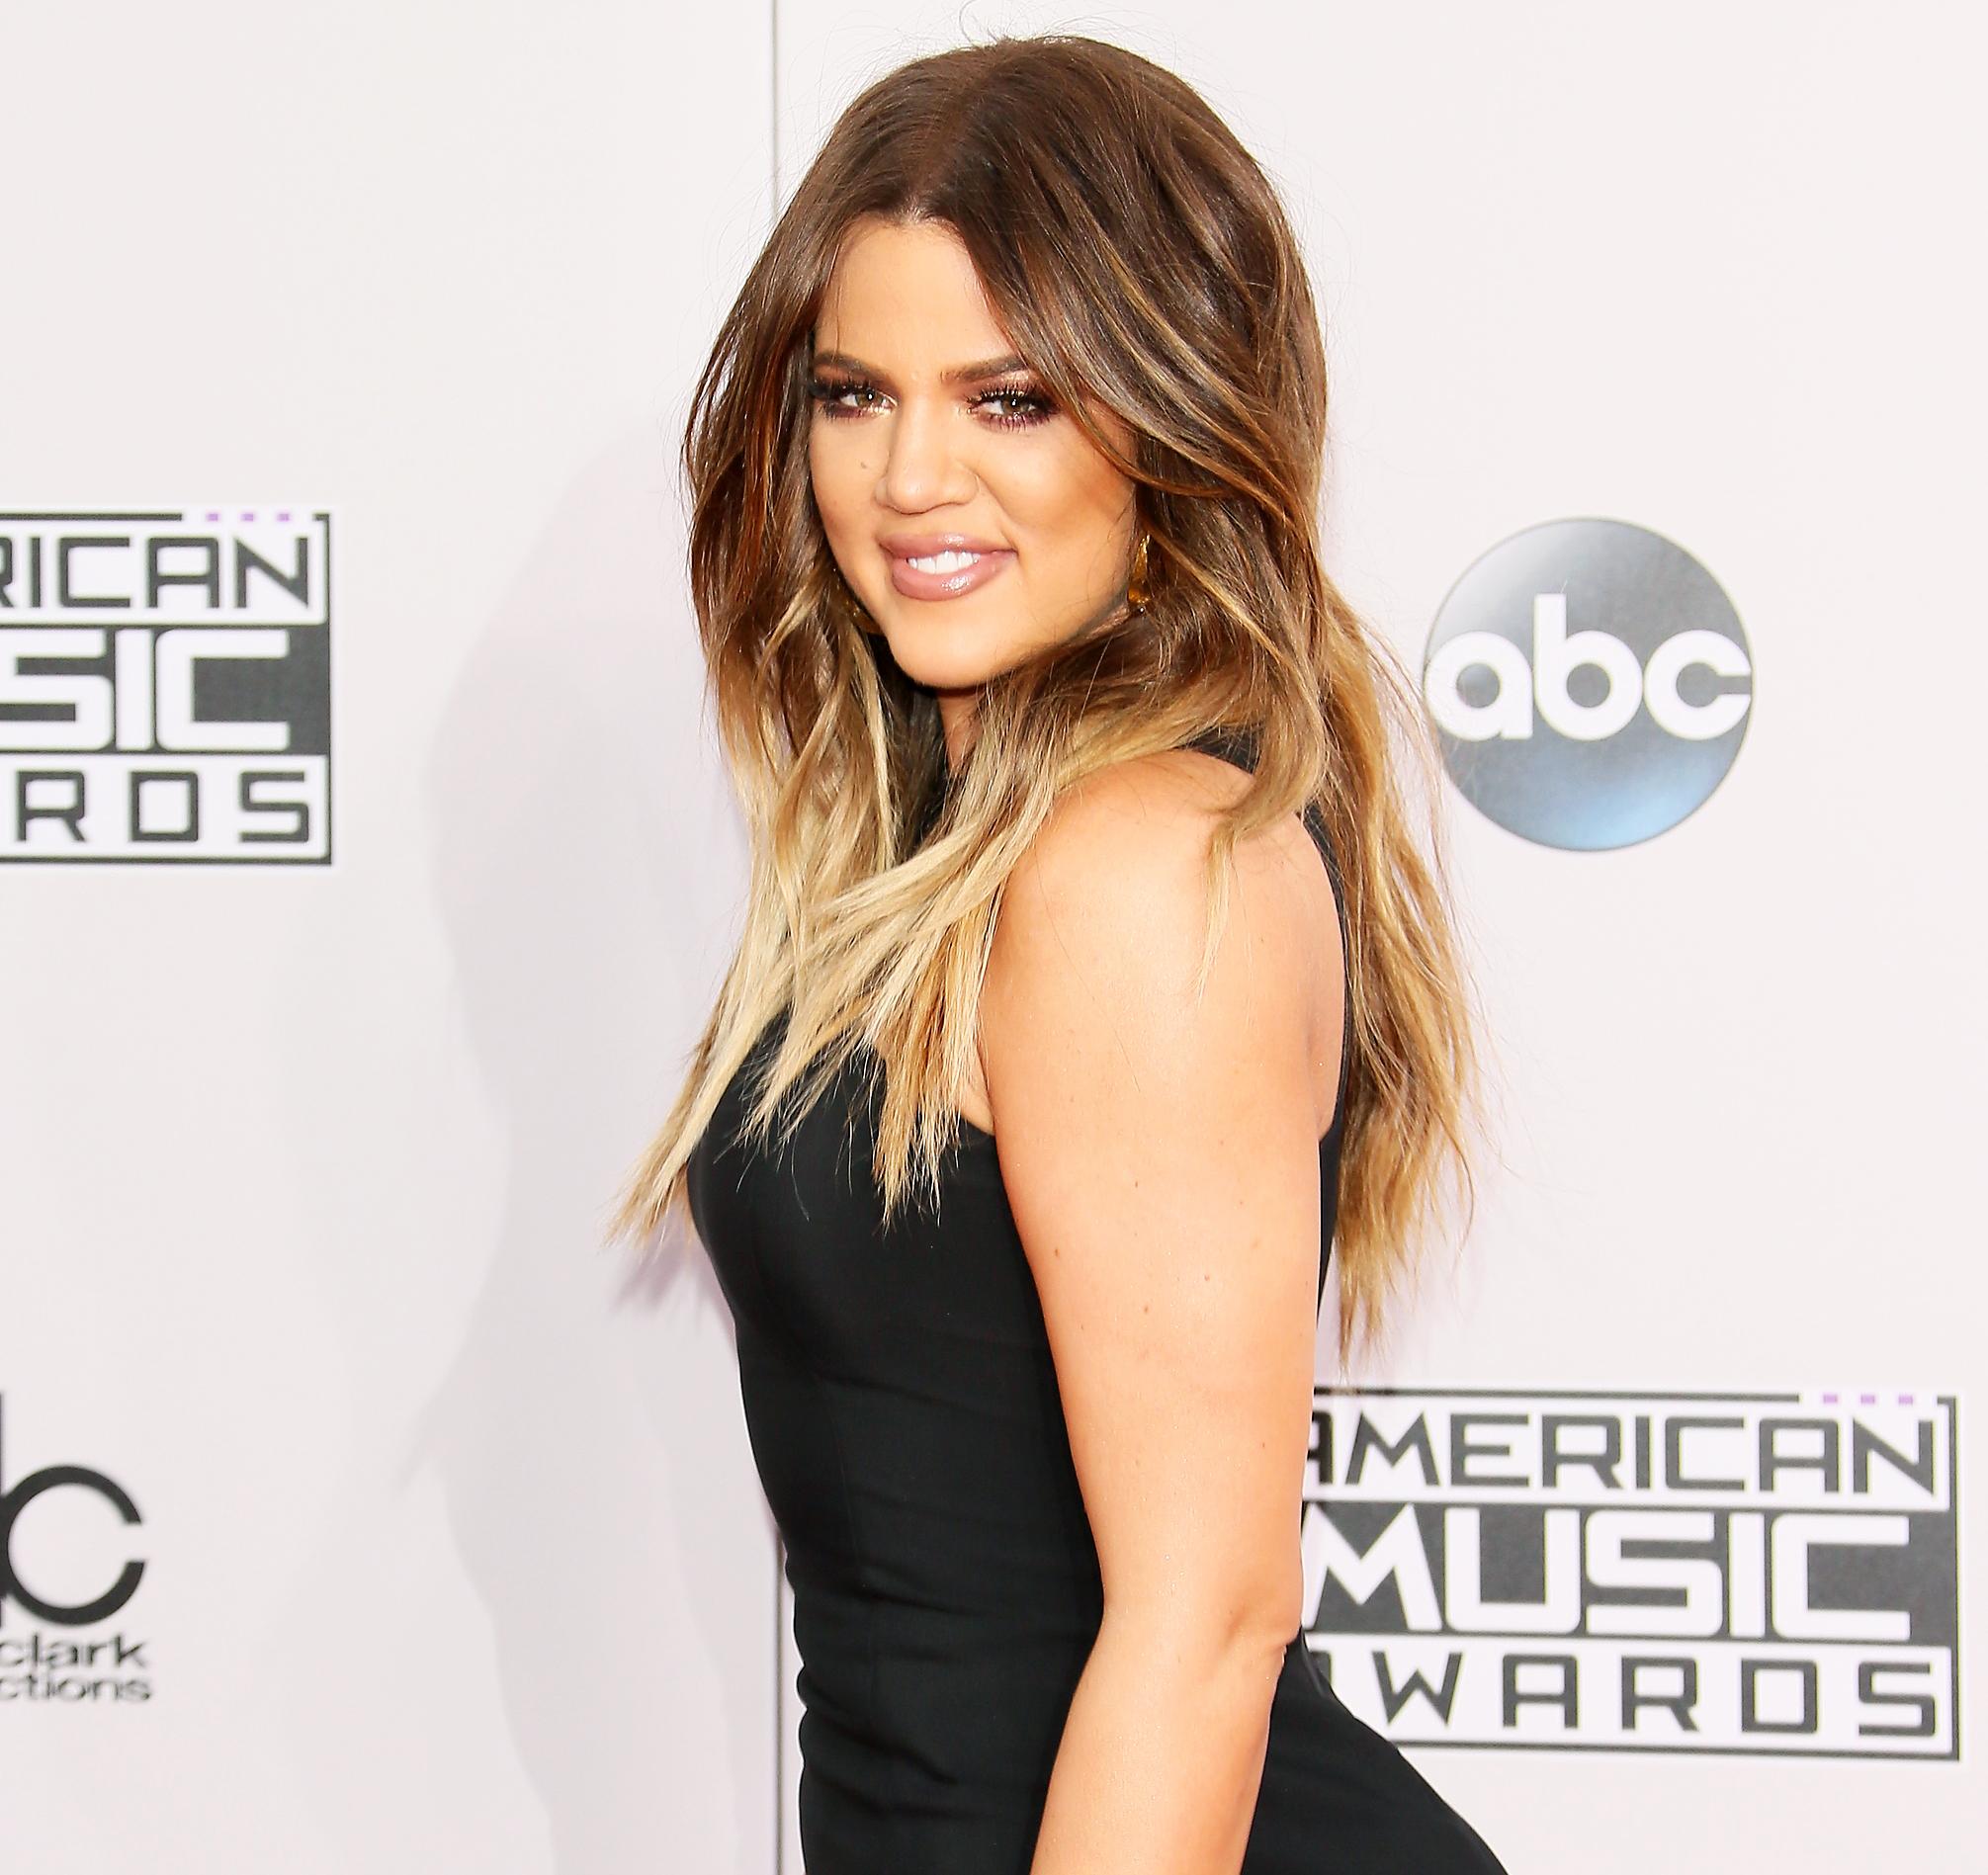 Khloe Kardashian Returns Home To California With Tristan Thompson